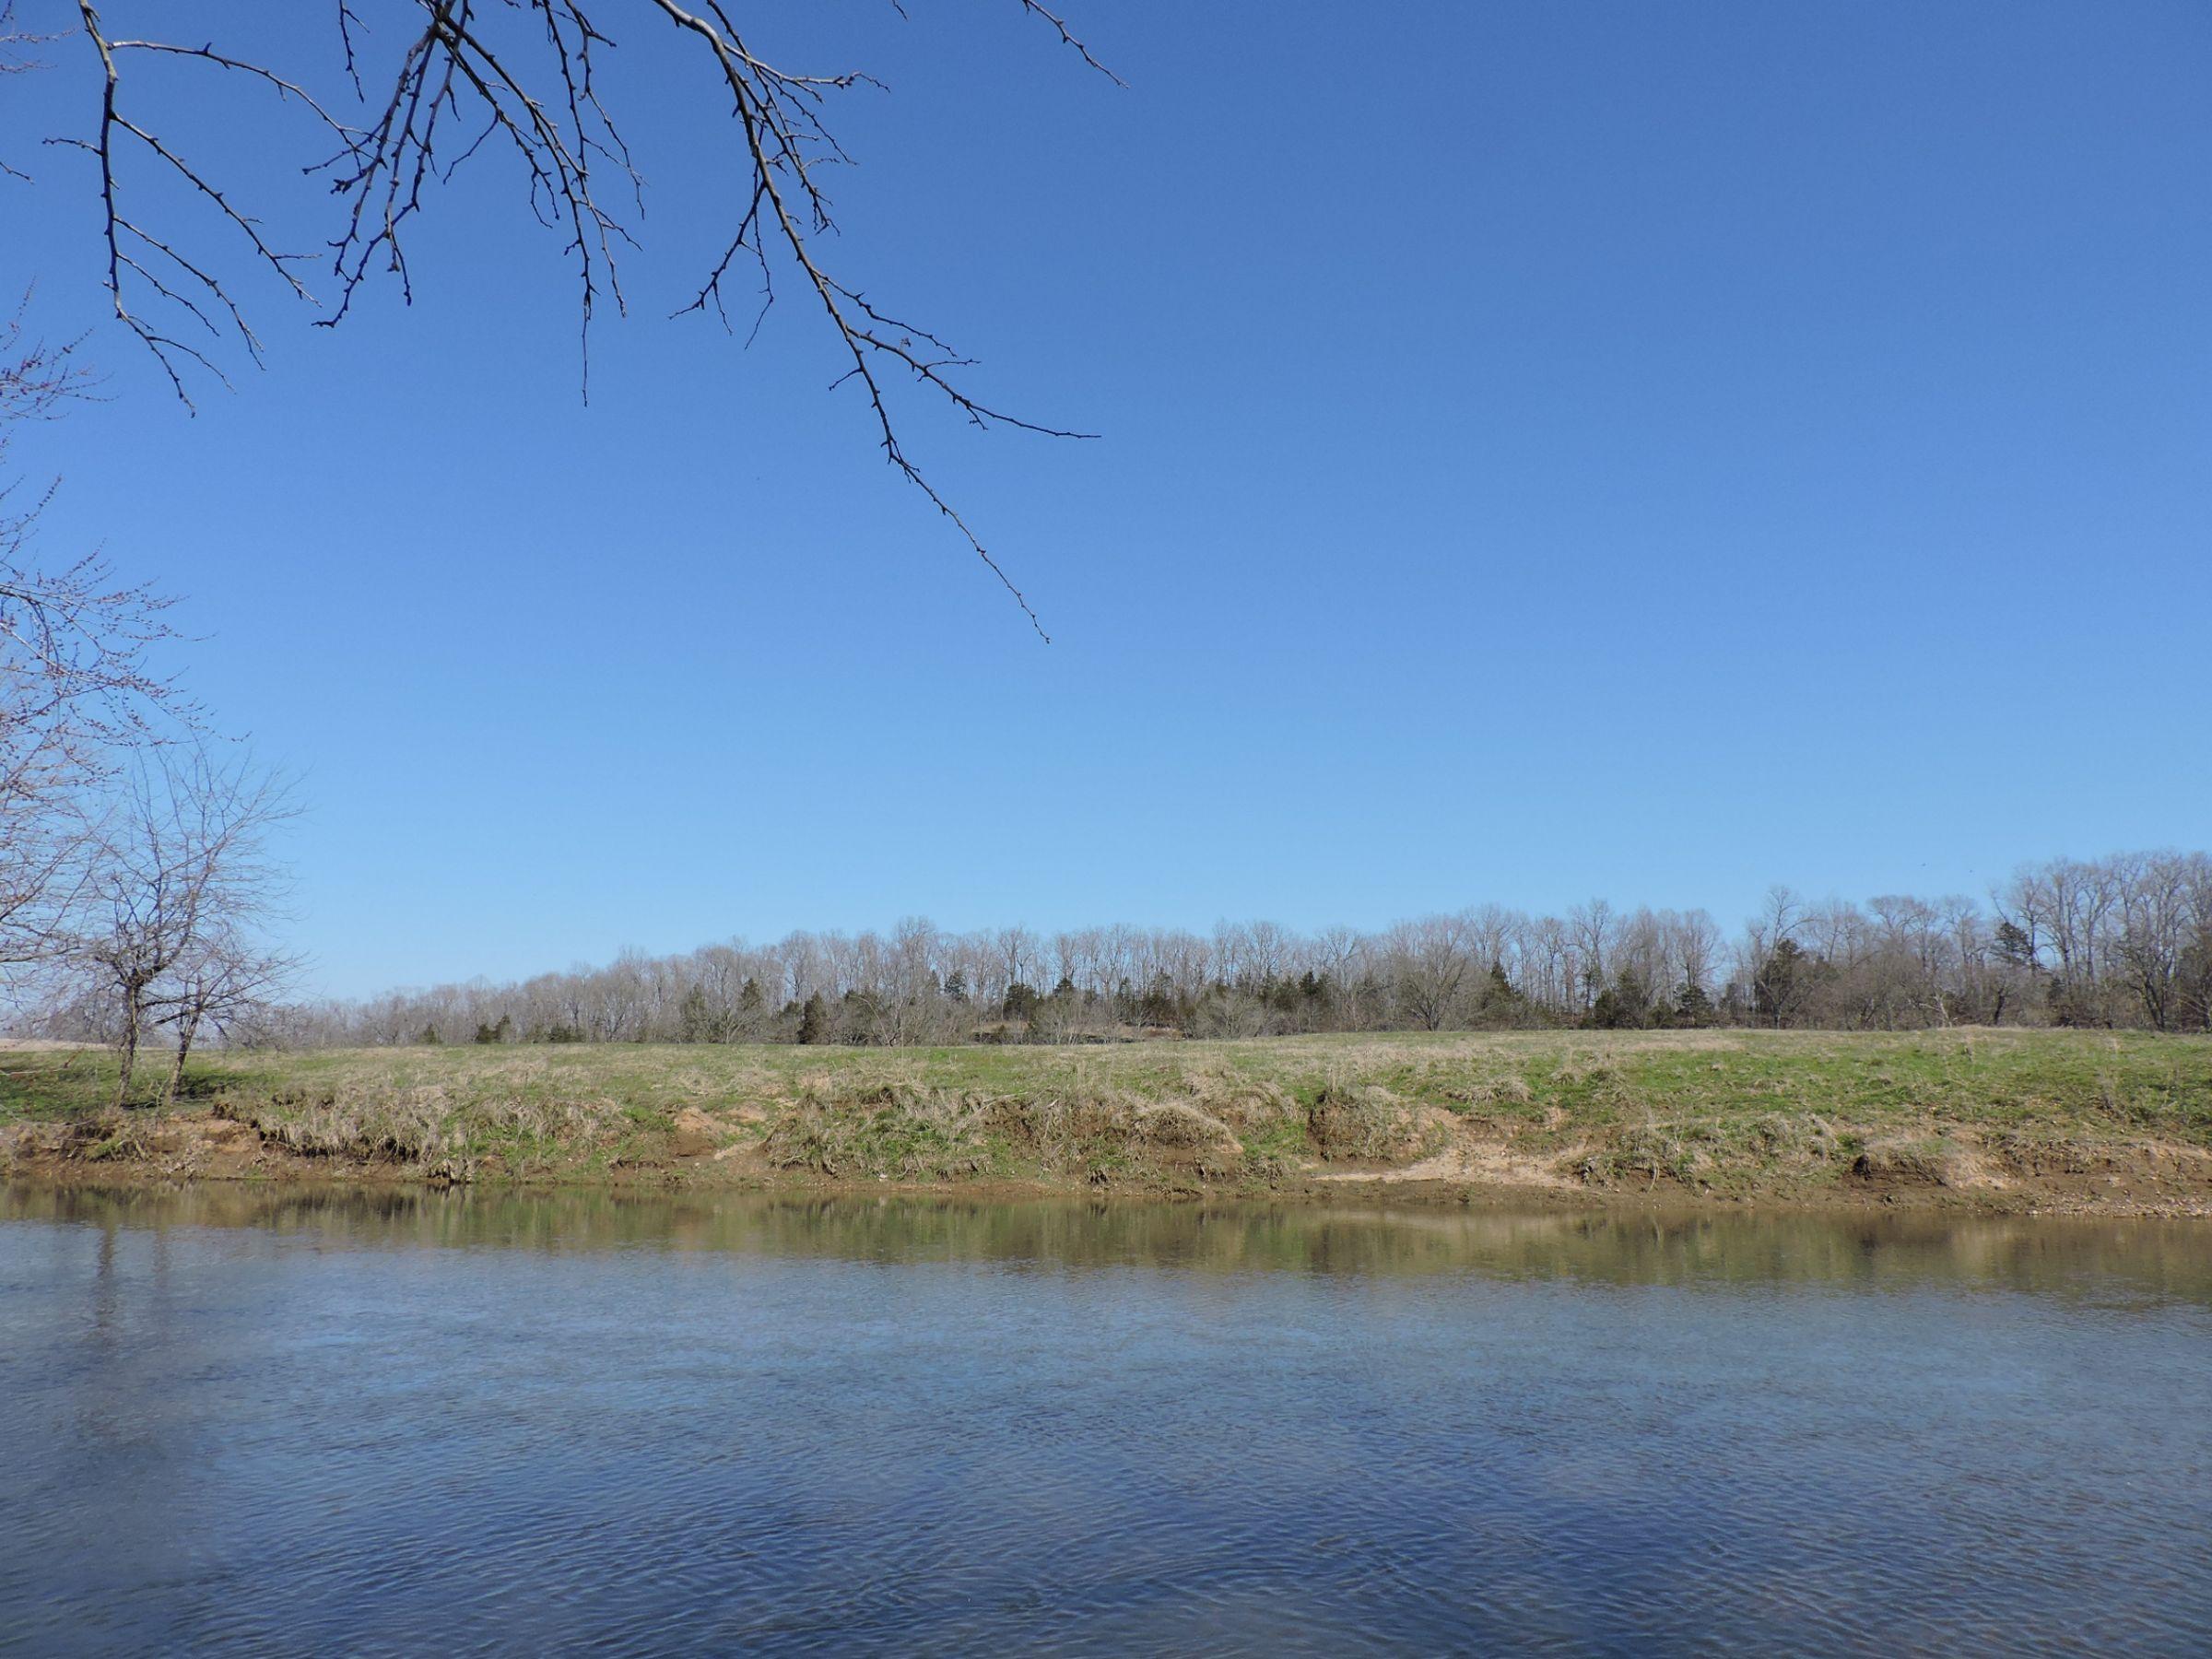 land-sharp-county-arkansas-695-acres-listing-number-15405-4-2021-03-10-174914.JPG